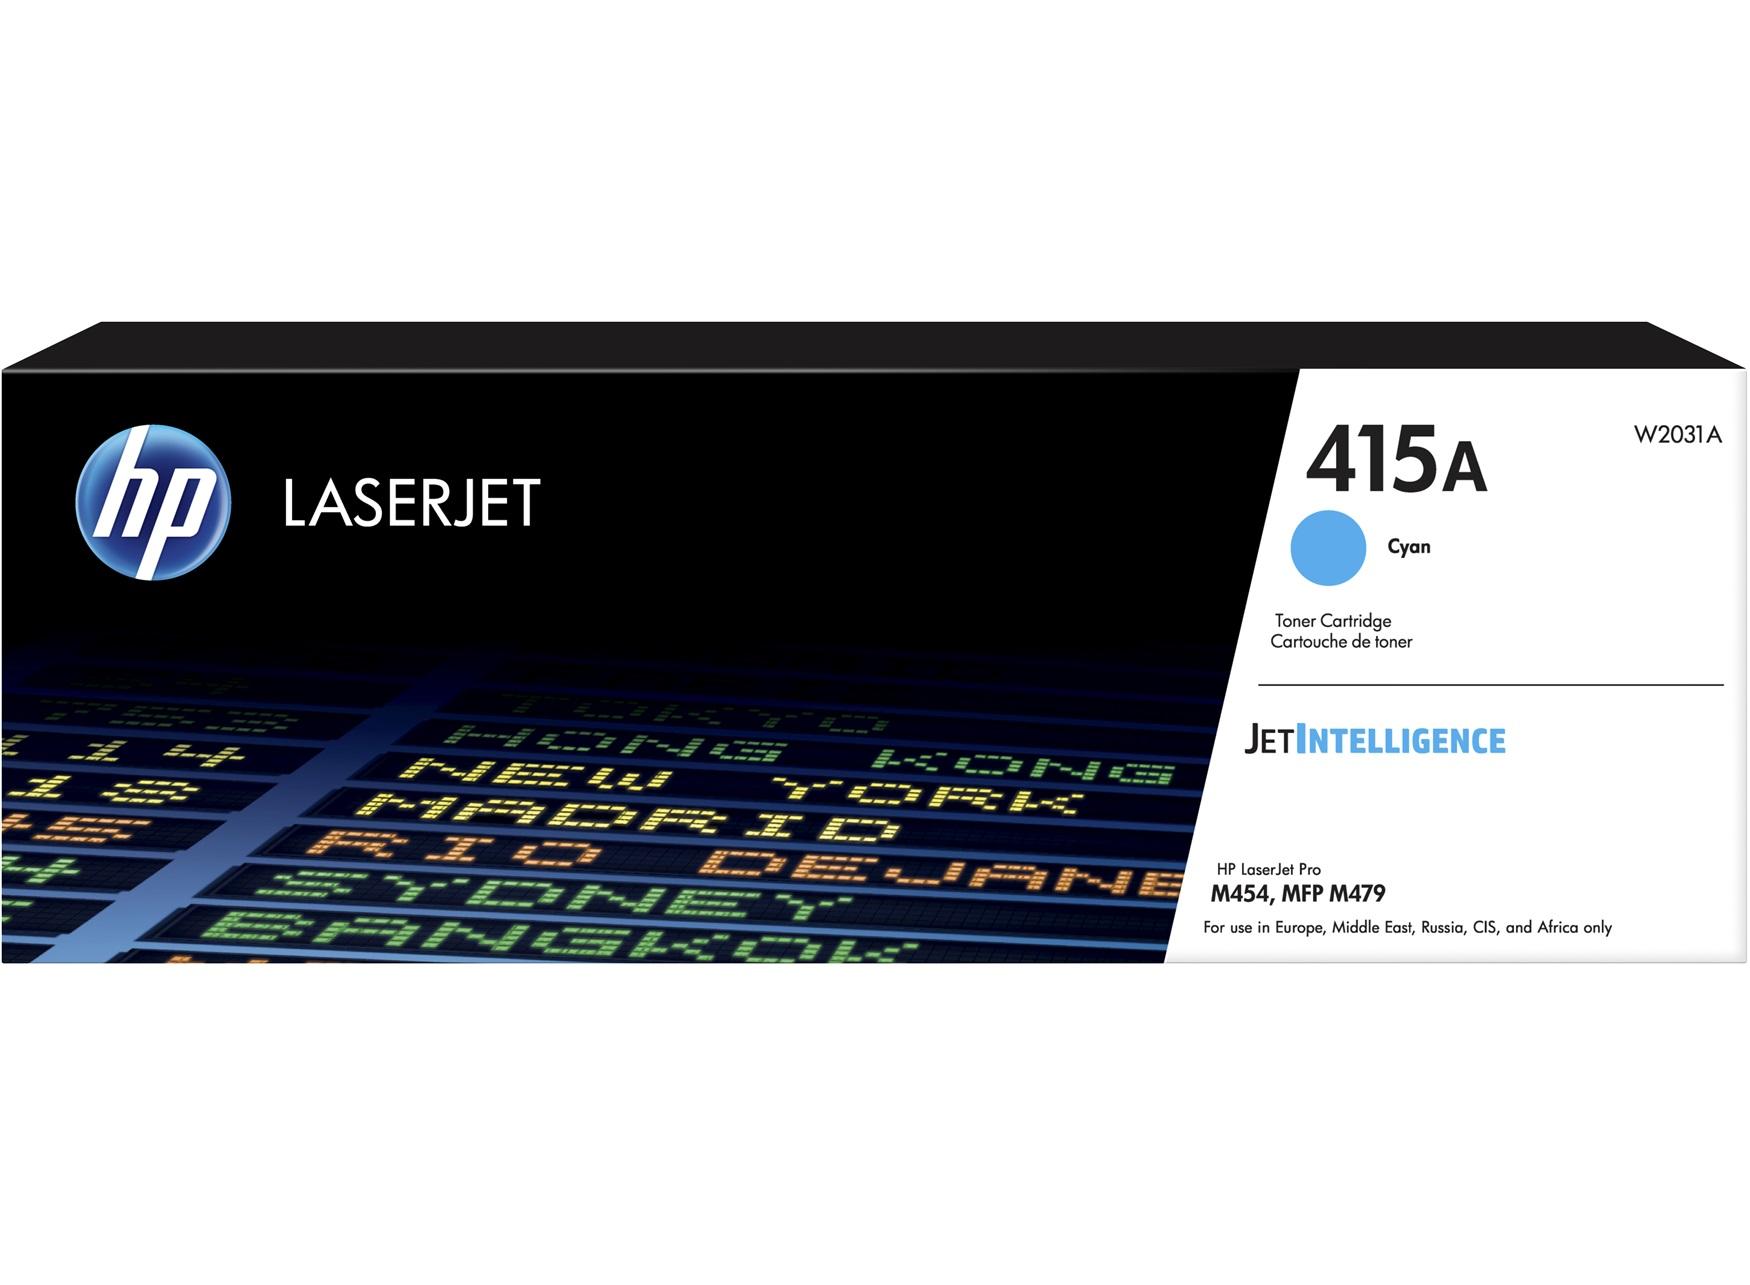 HP 415A Cyan LaserJet Toner Cartridge, W2031A